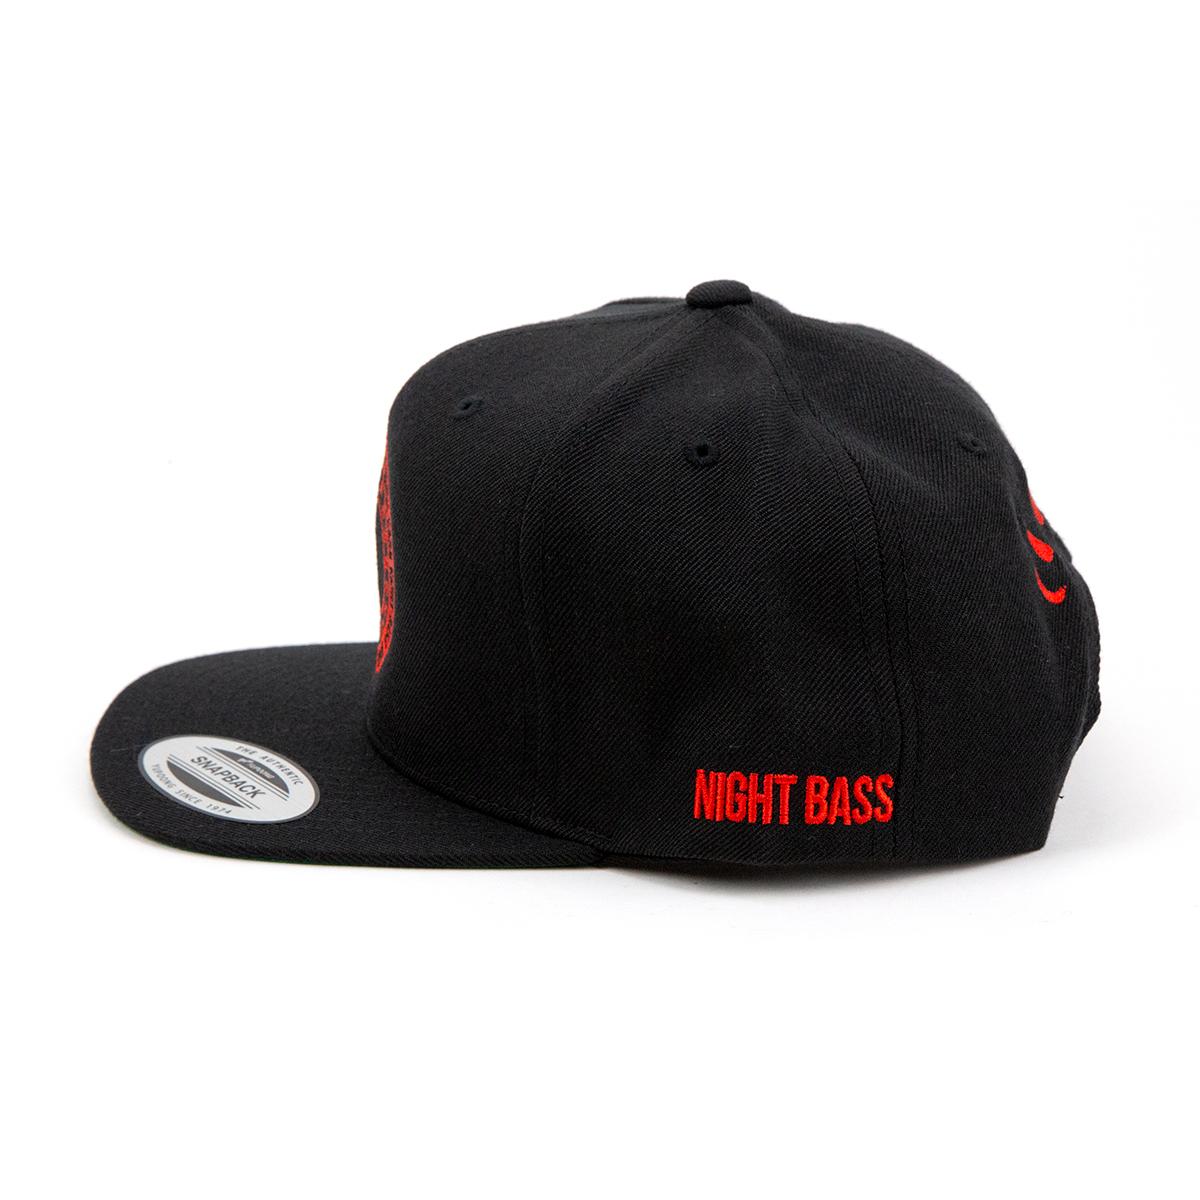 Night Bass Crest Snapback